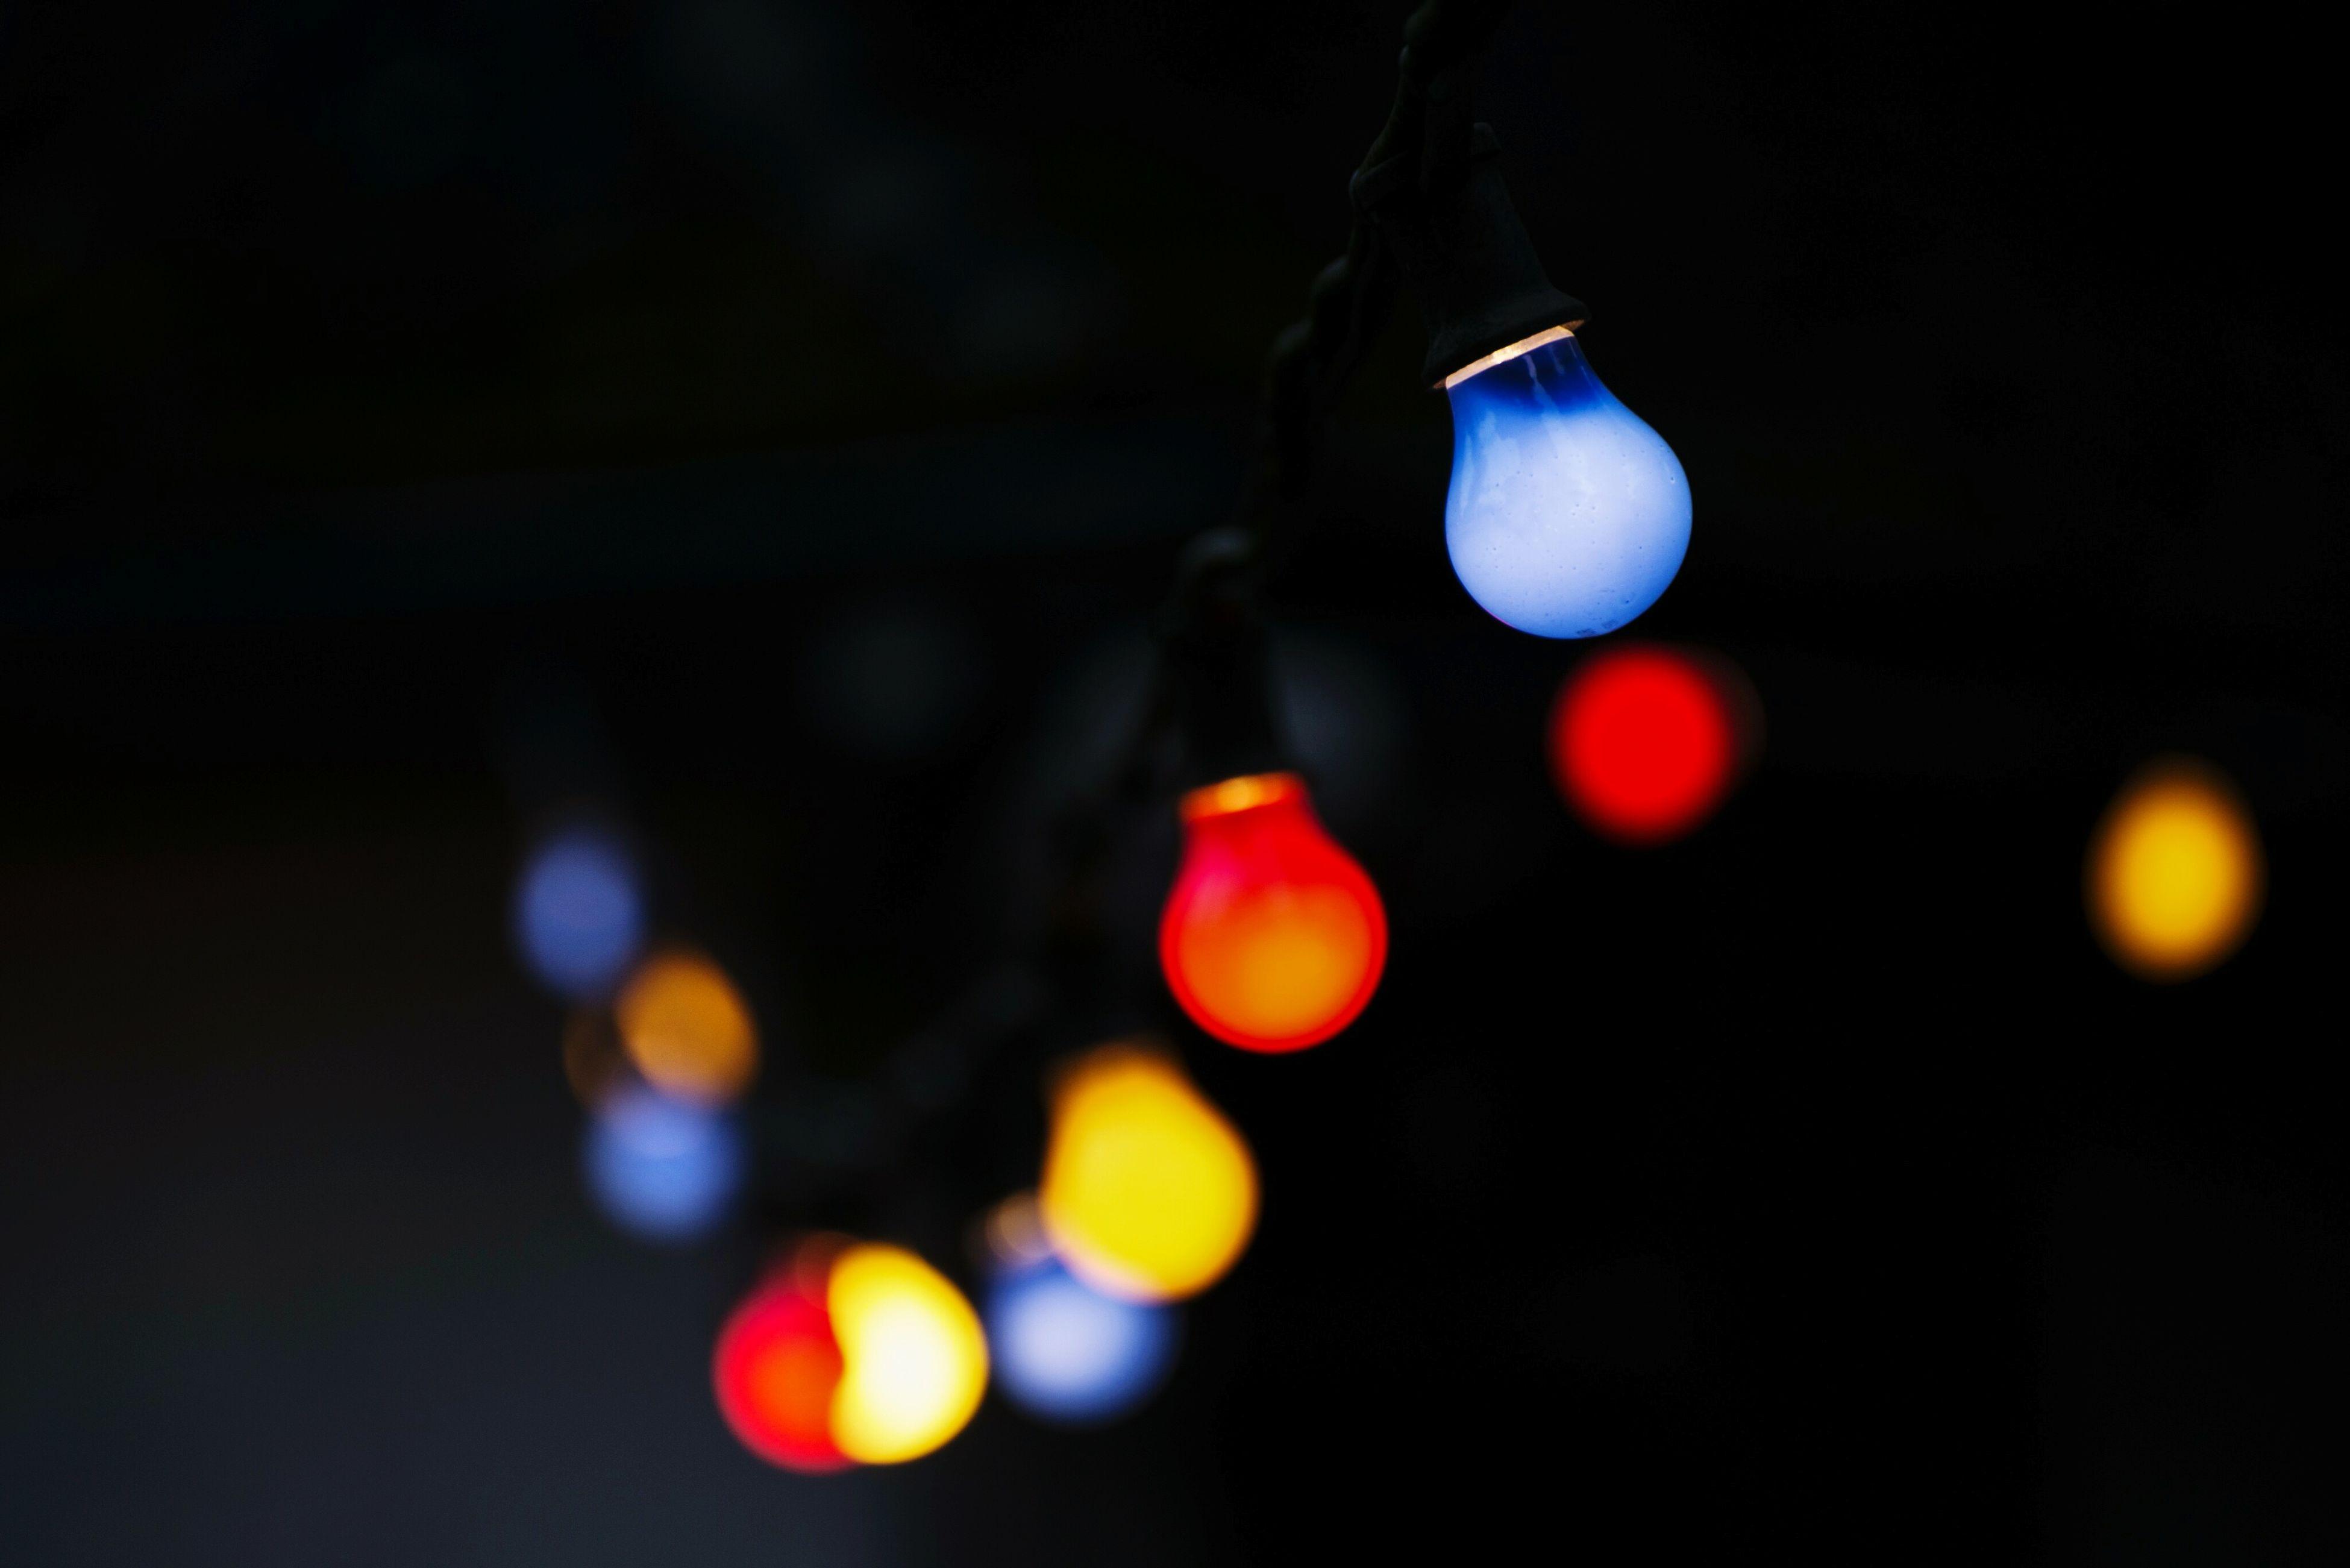 illuminated, lighting equipment, night, close-up, no people, christmas decoration, defocused, christmas, outdoors, light effect, christmas ornament